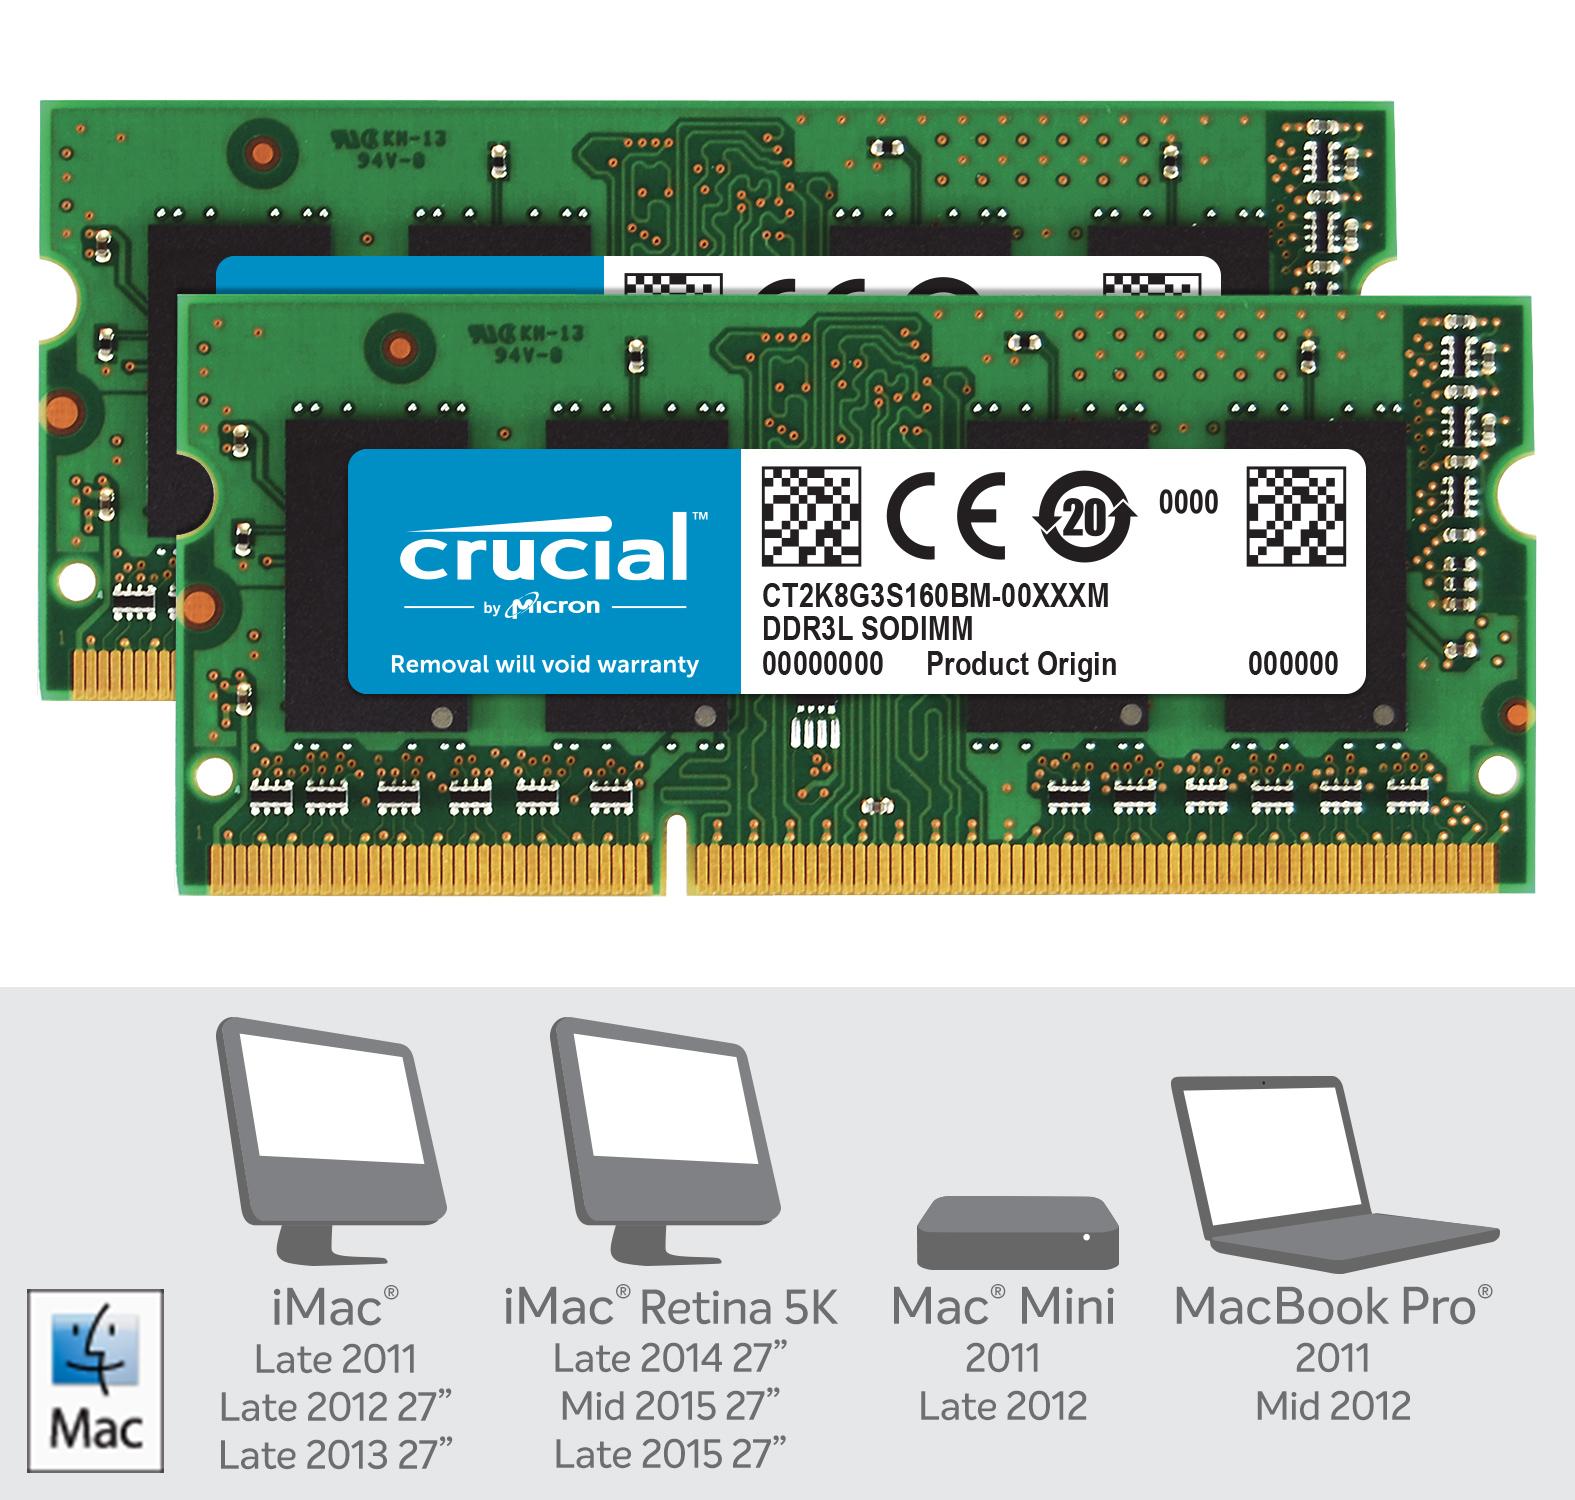 Crucial 16GB Kit (2 x 8GB) DDR3L-1600 SODIMM Memory for Mac- view 2